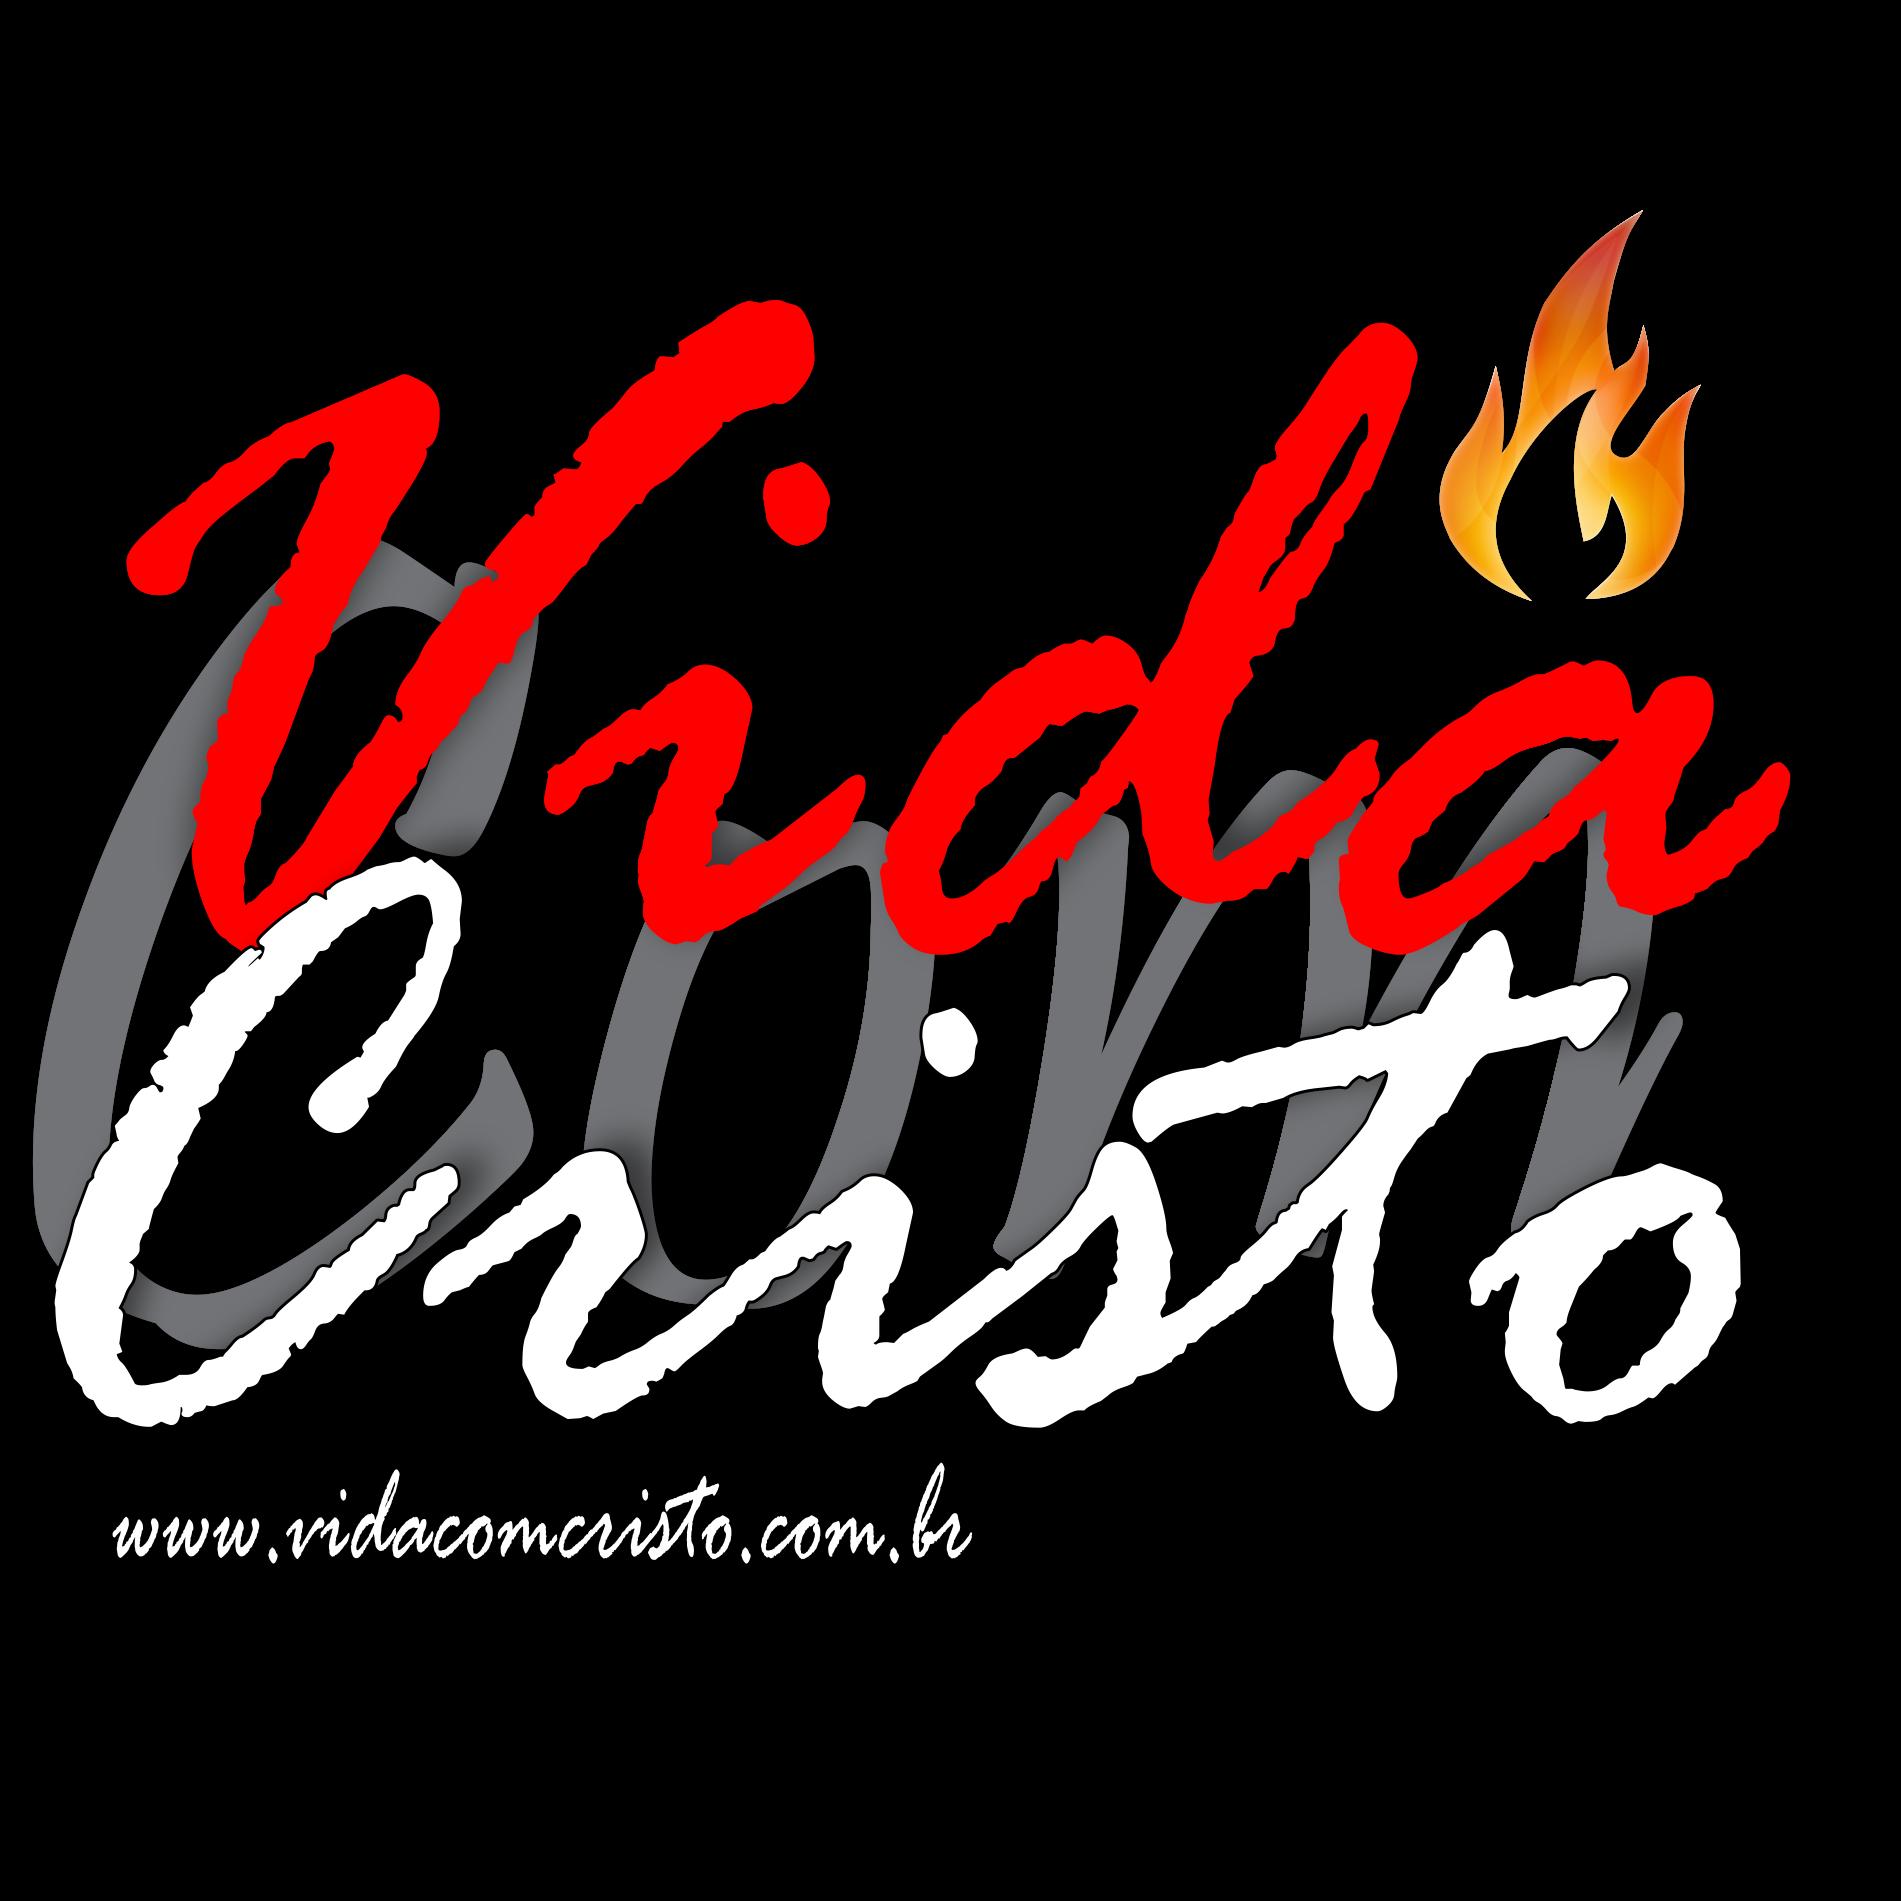 Vida com Cristo